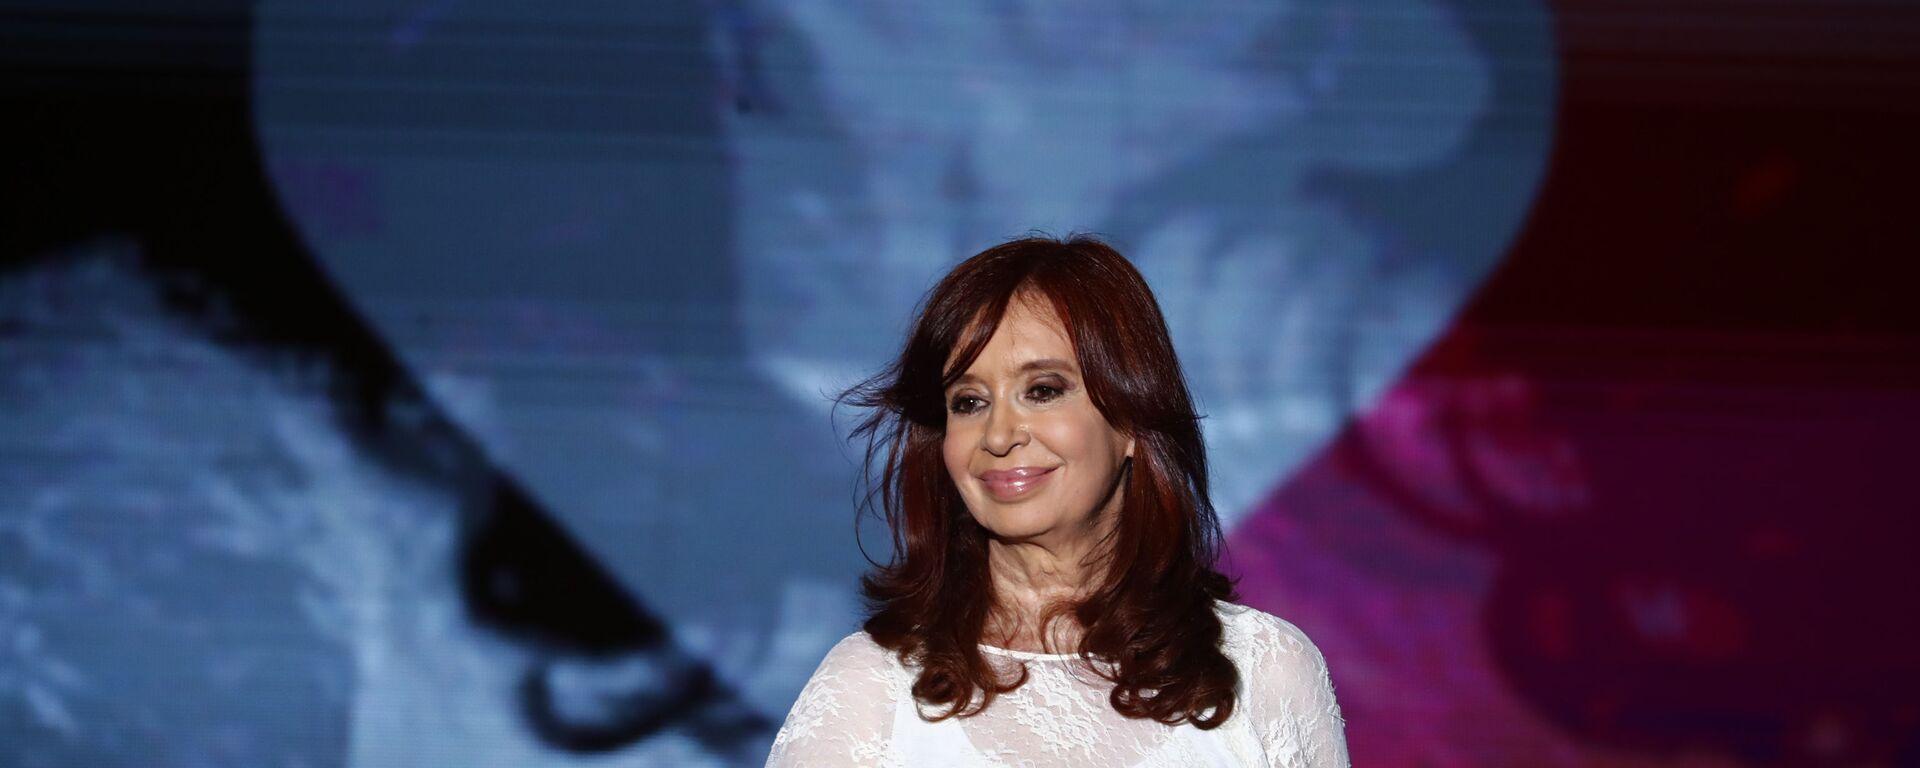 La vicepresidenta argentina Cristina Fernández de Kirchner - Sputnik Mundo, 1920, 09.09.2021